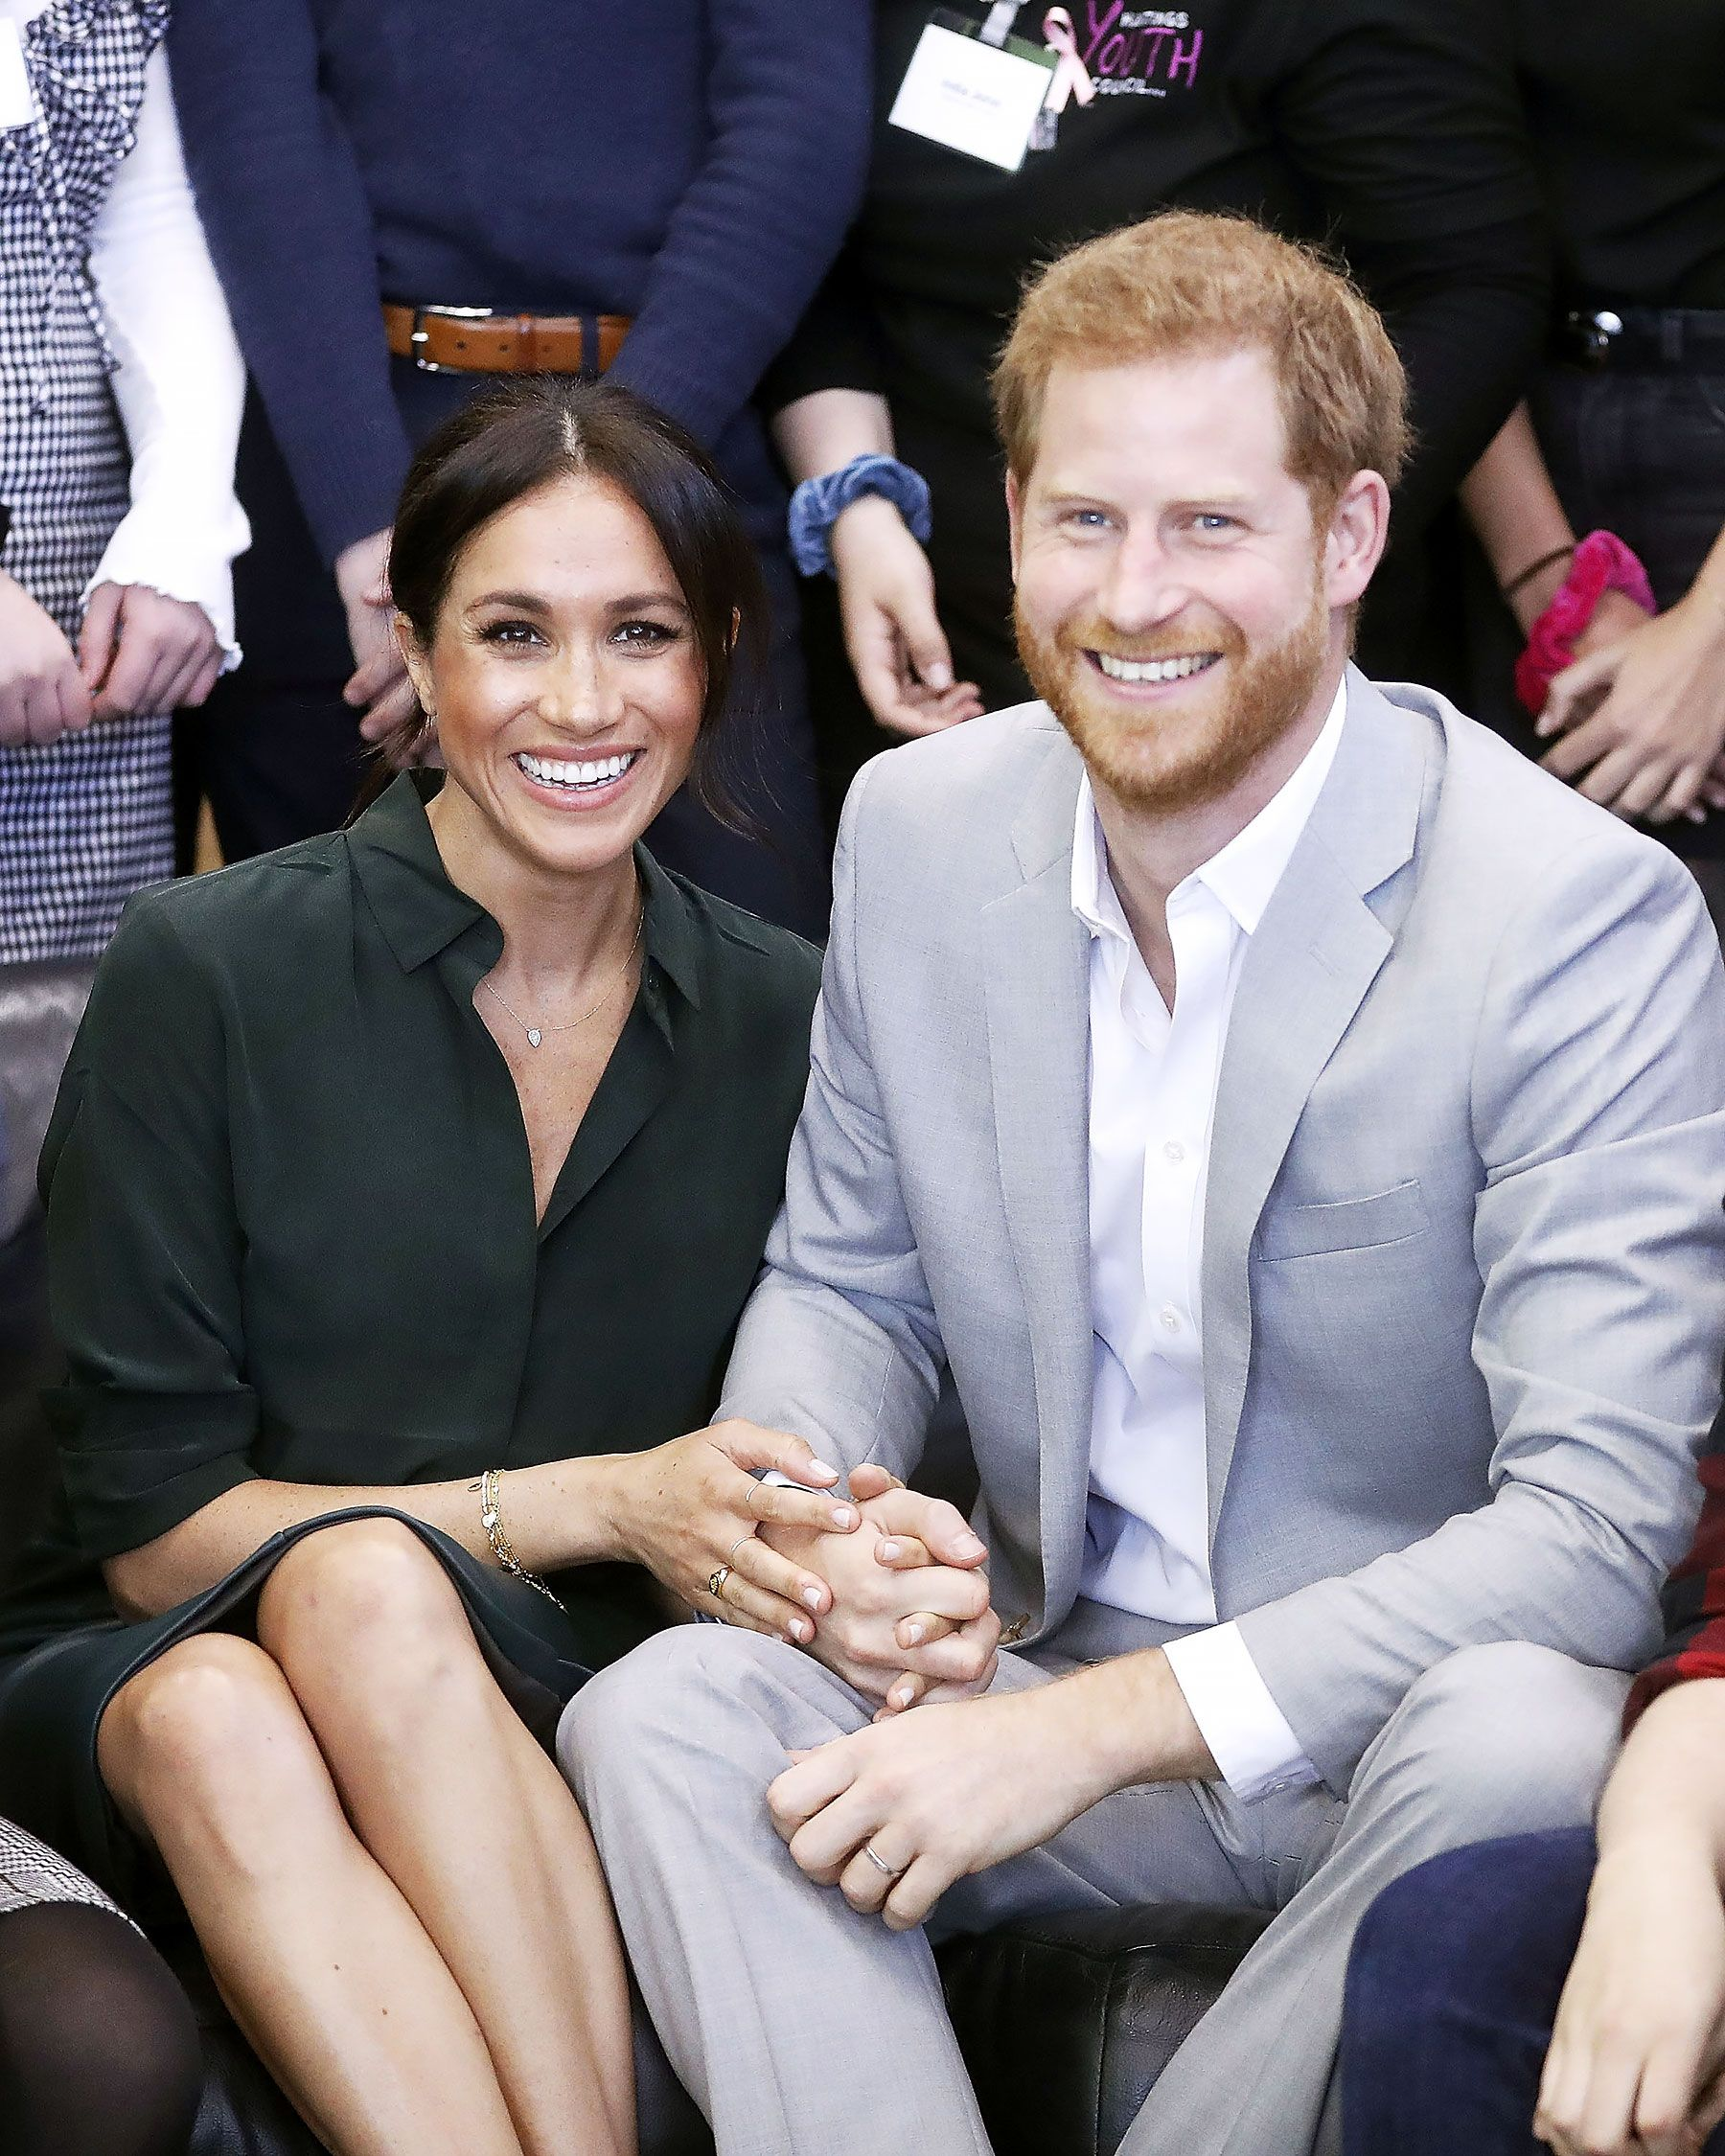 Meghan Markle And Prince Harry Prove The Honeymoon Isn't